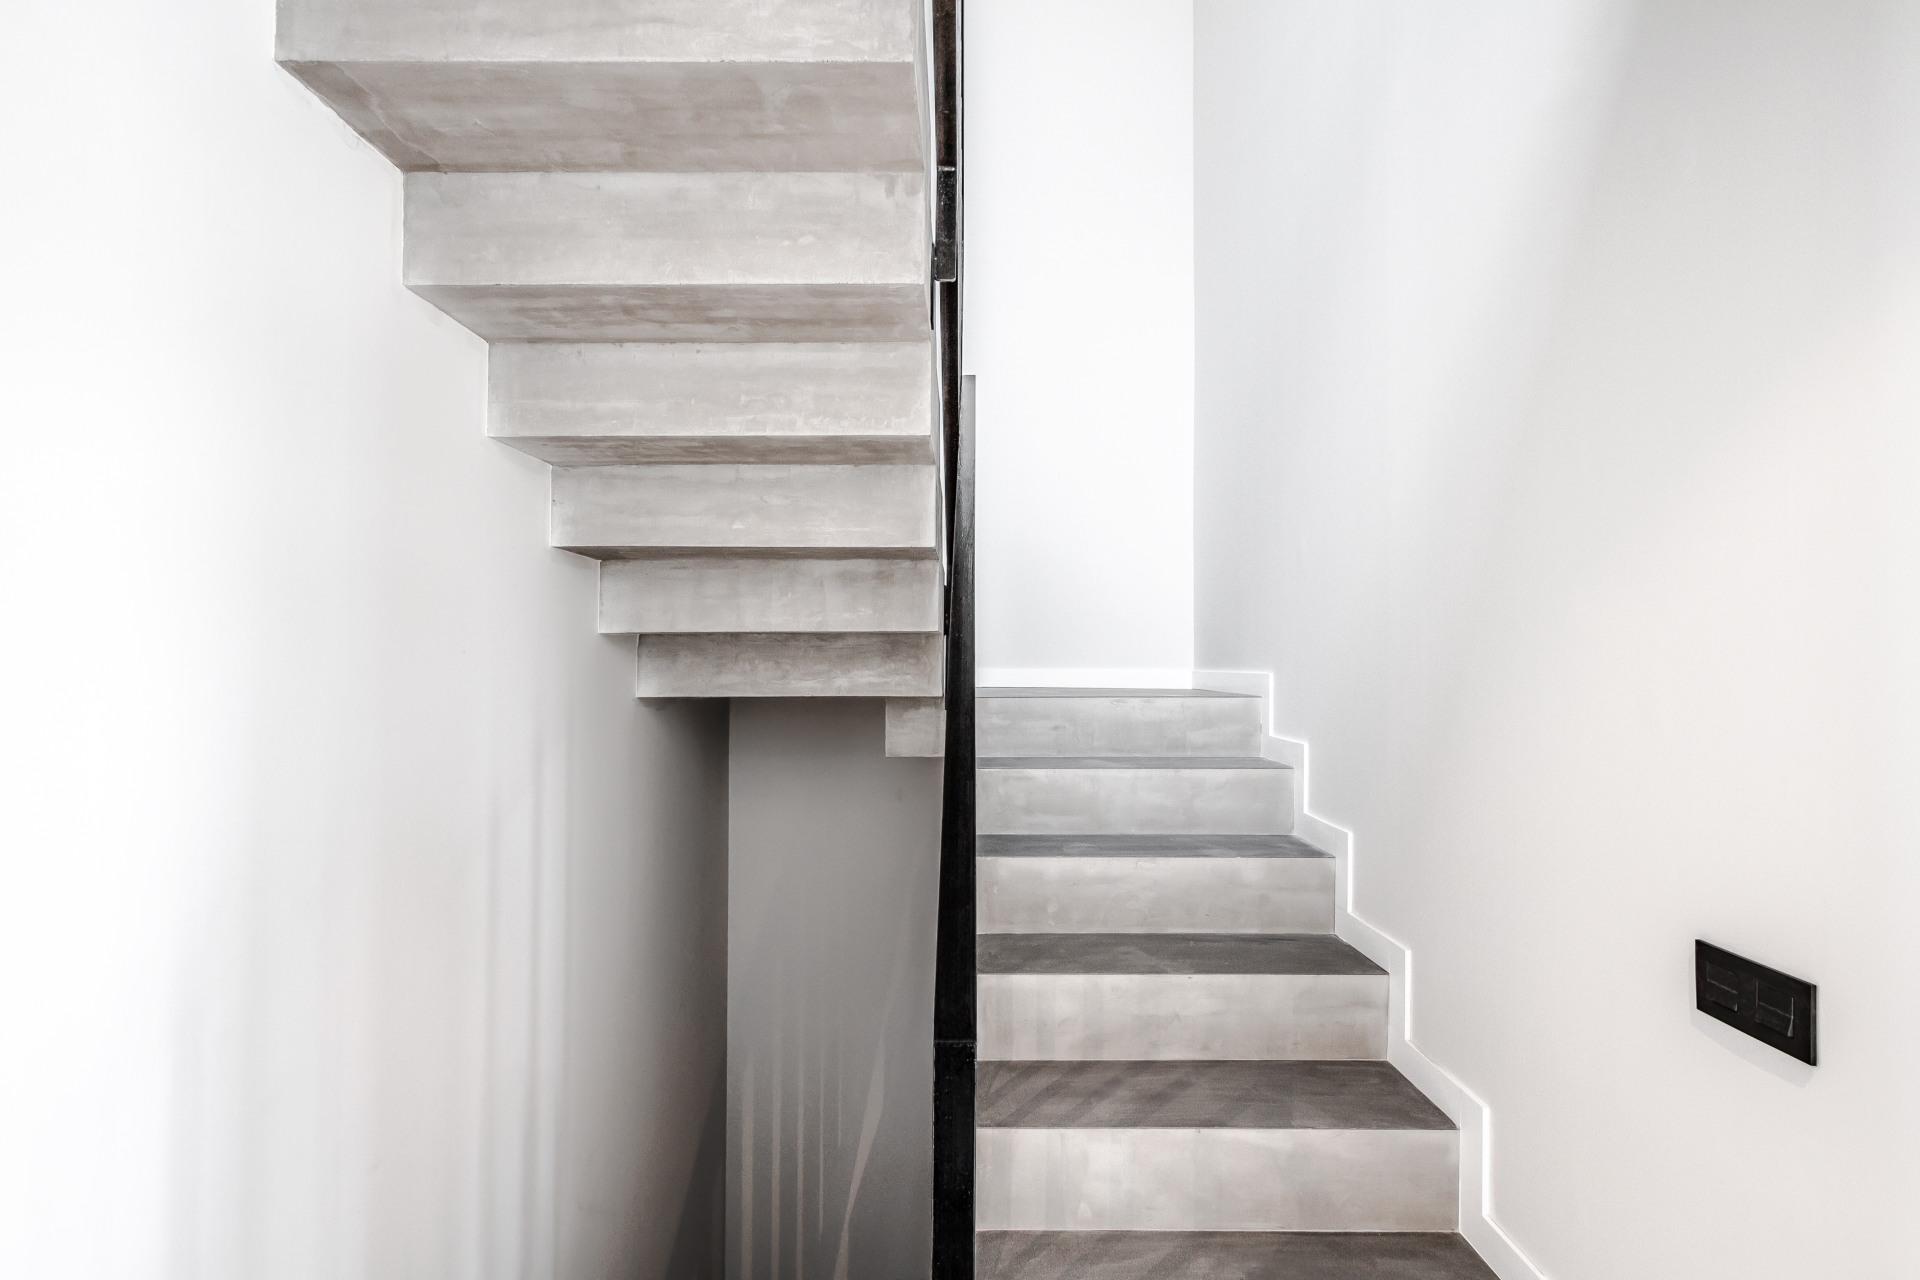 fotografia-arquitectura-valencia-german-cabo-viraje-v01 (8)